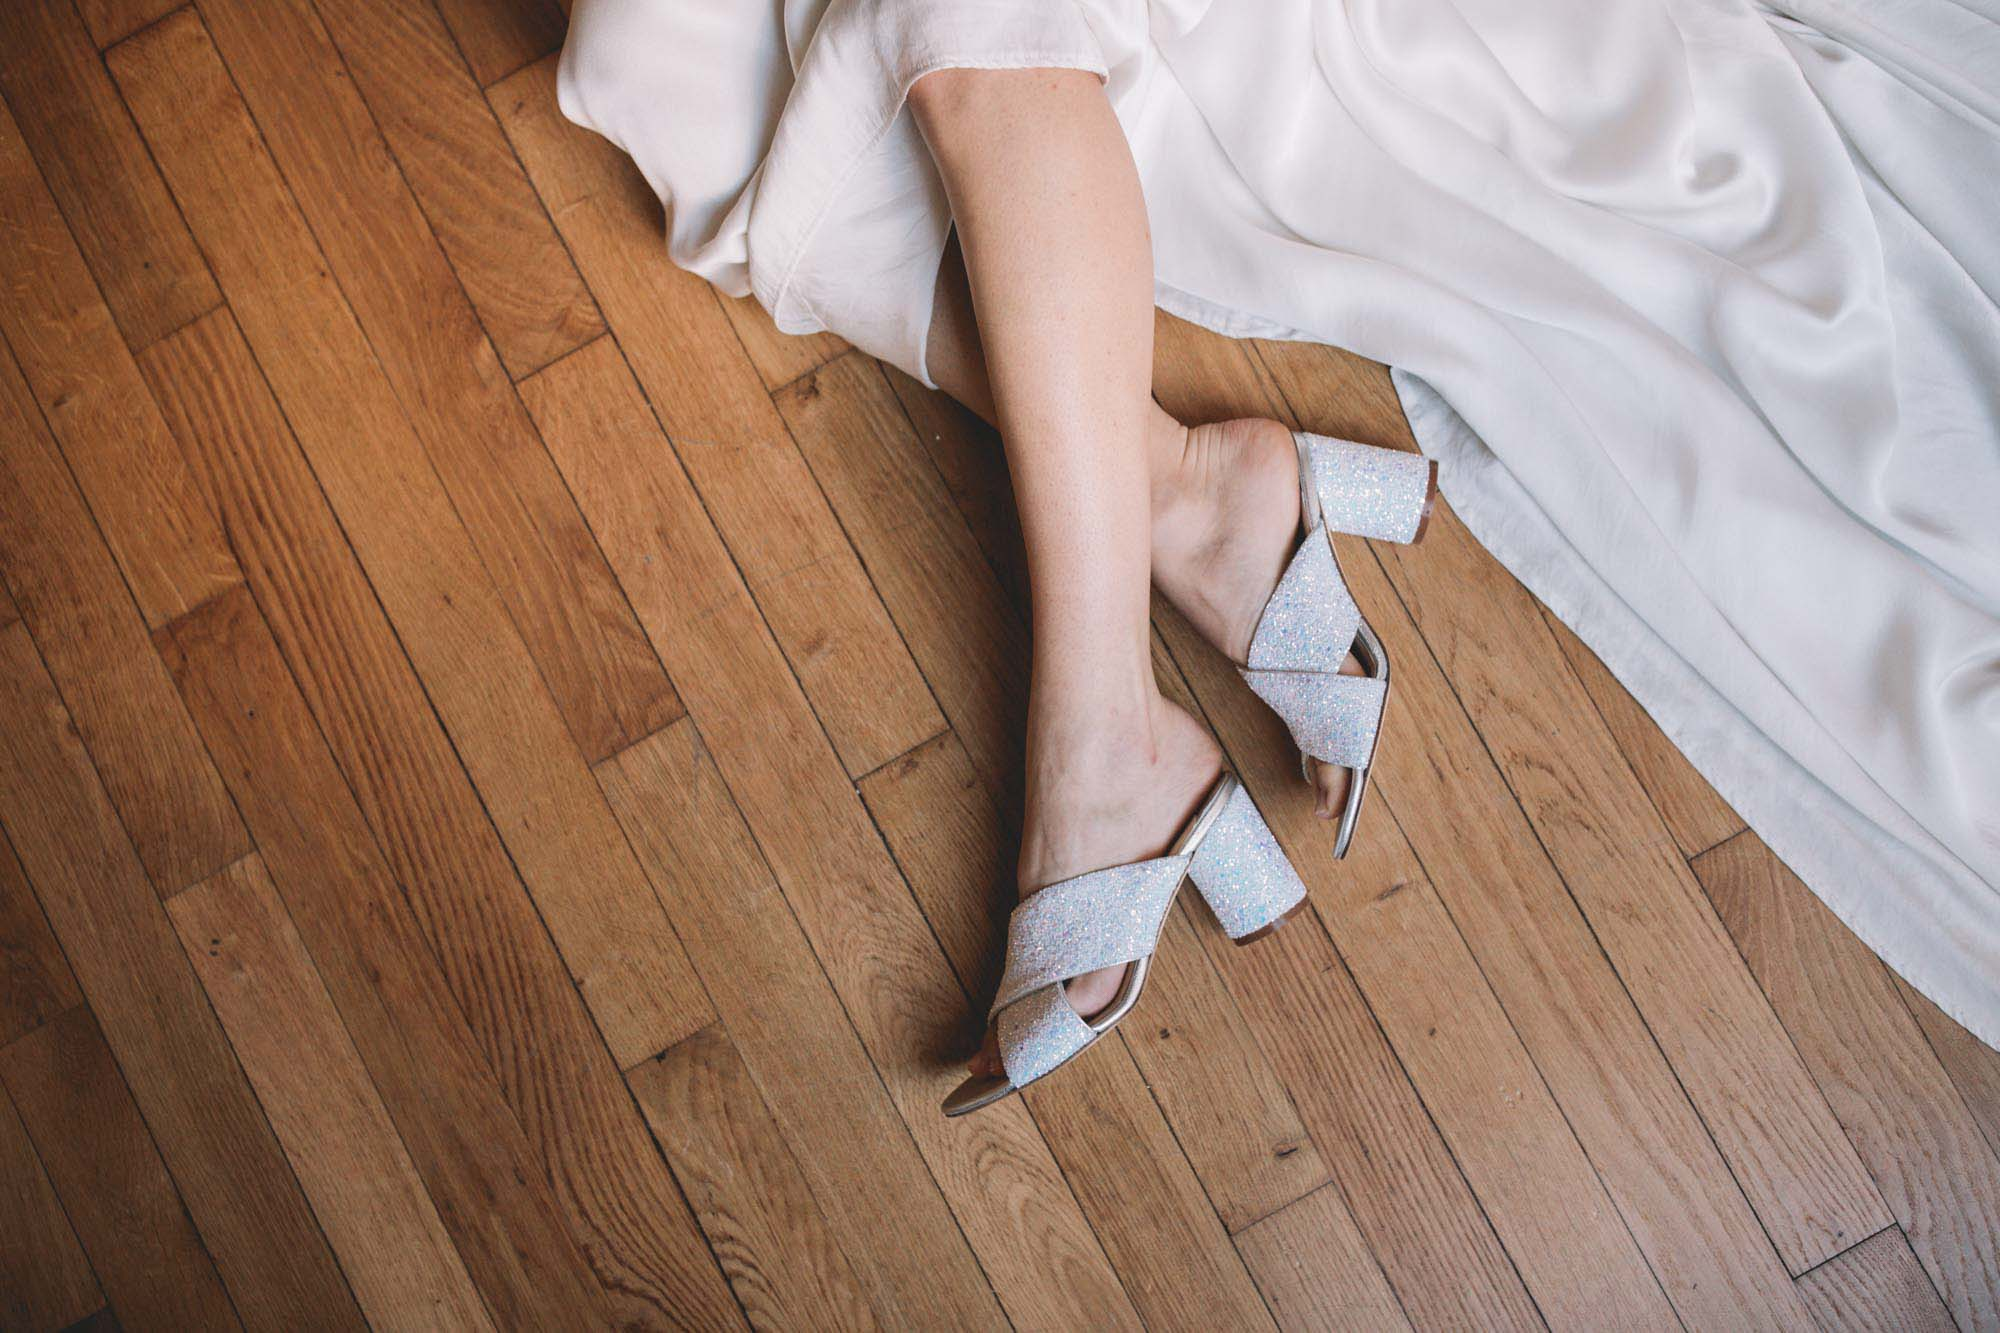 JEANNE SOURCE_CHABERLAN_PARIS_PHOTOGRAPHE_MARIAGE_LES BANDITS-10